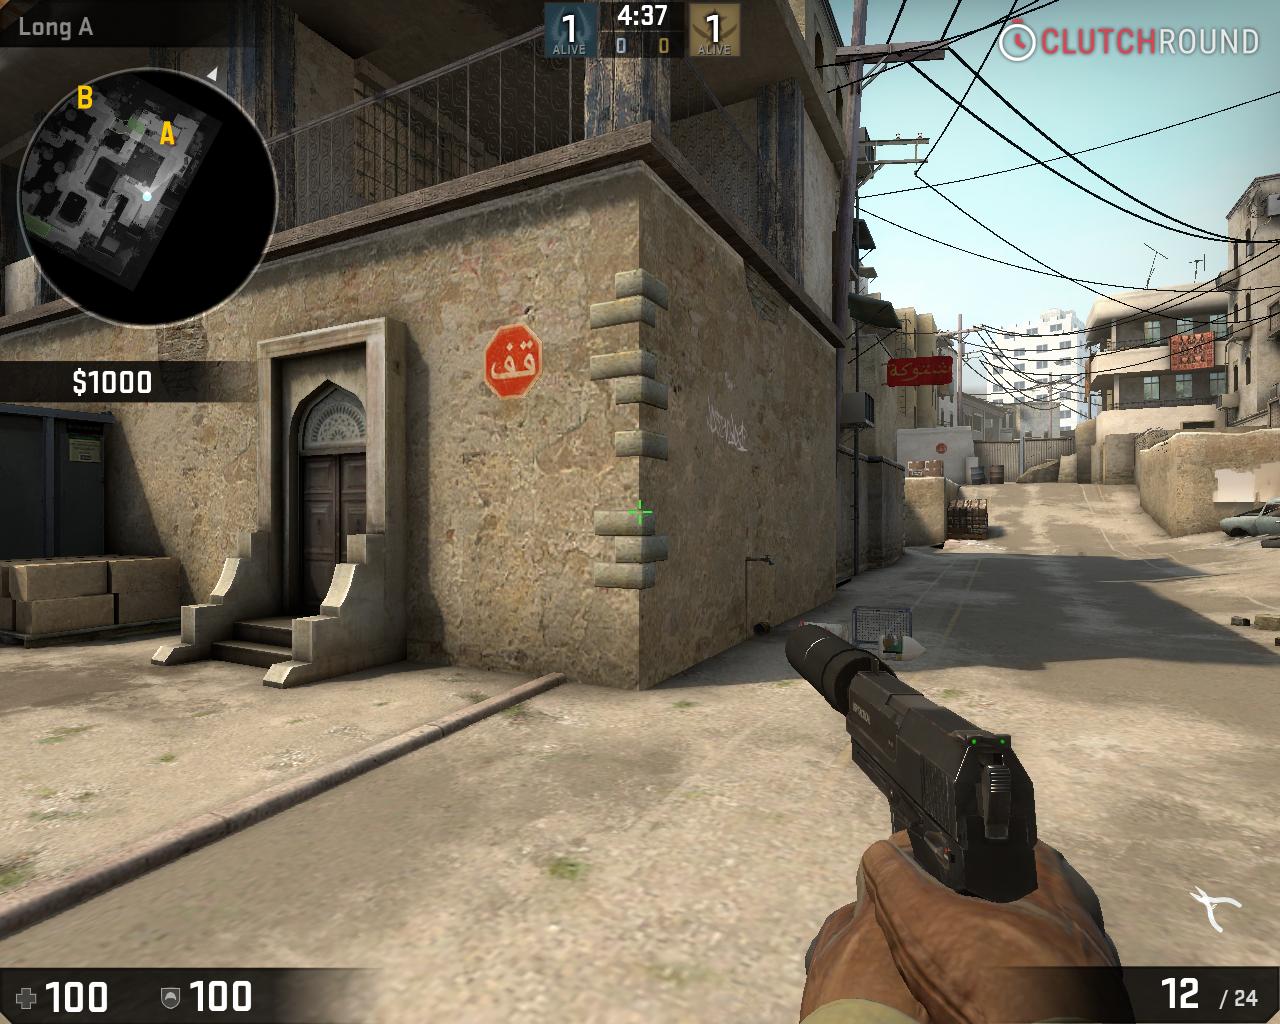 CS:GO - Video settings comparison and Tweaking Guide